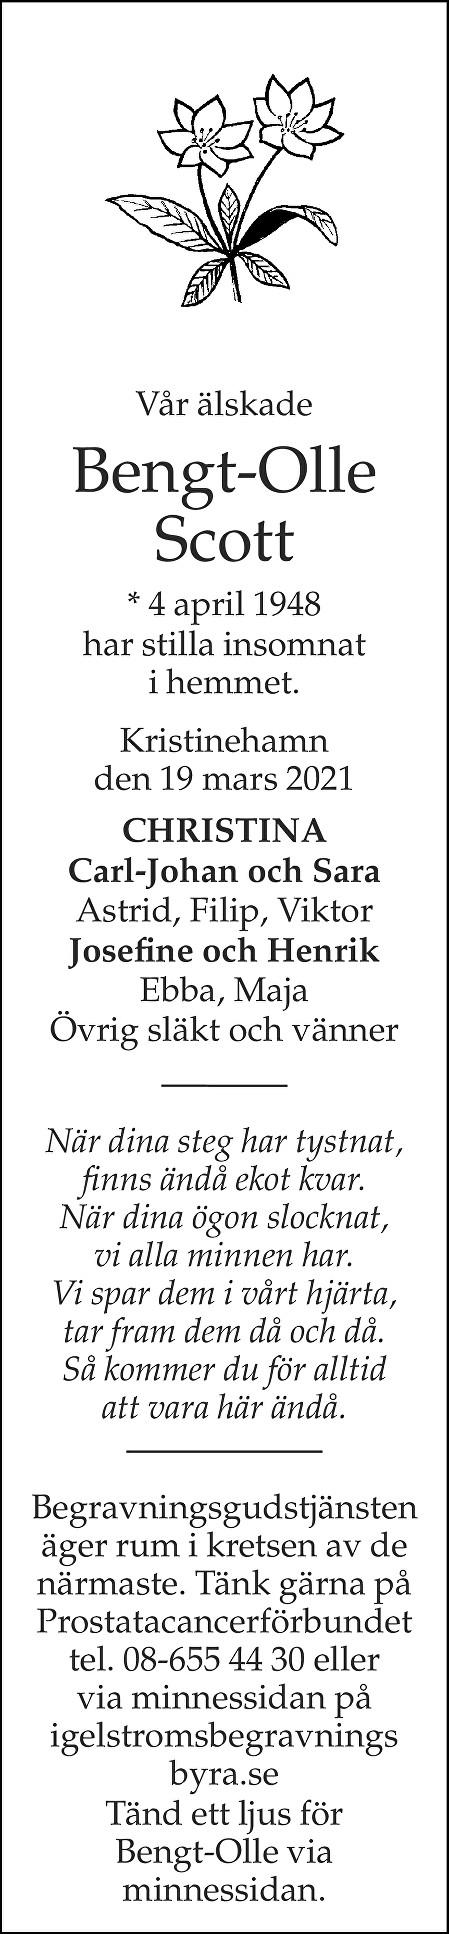 Bengt-Olle Scott Death notice